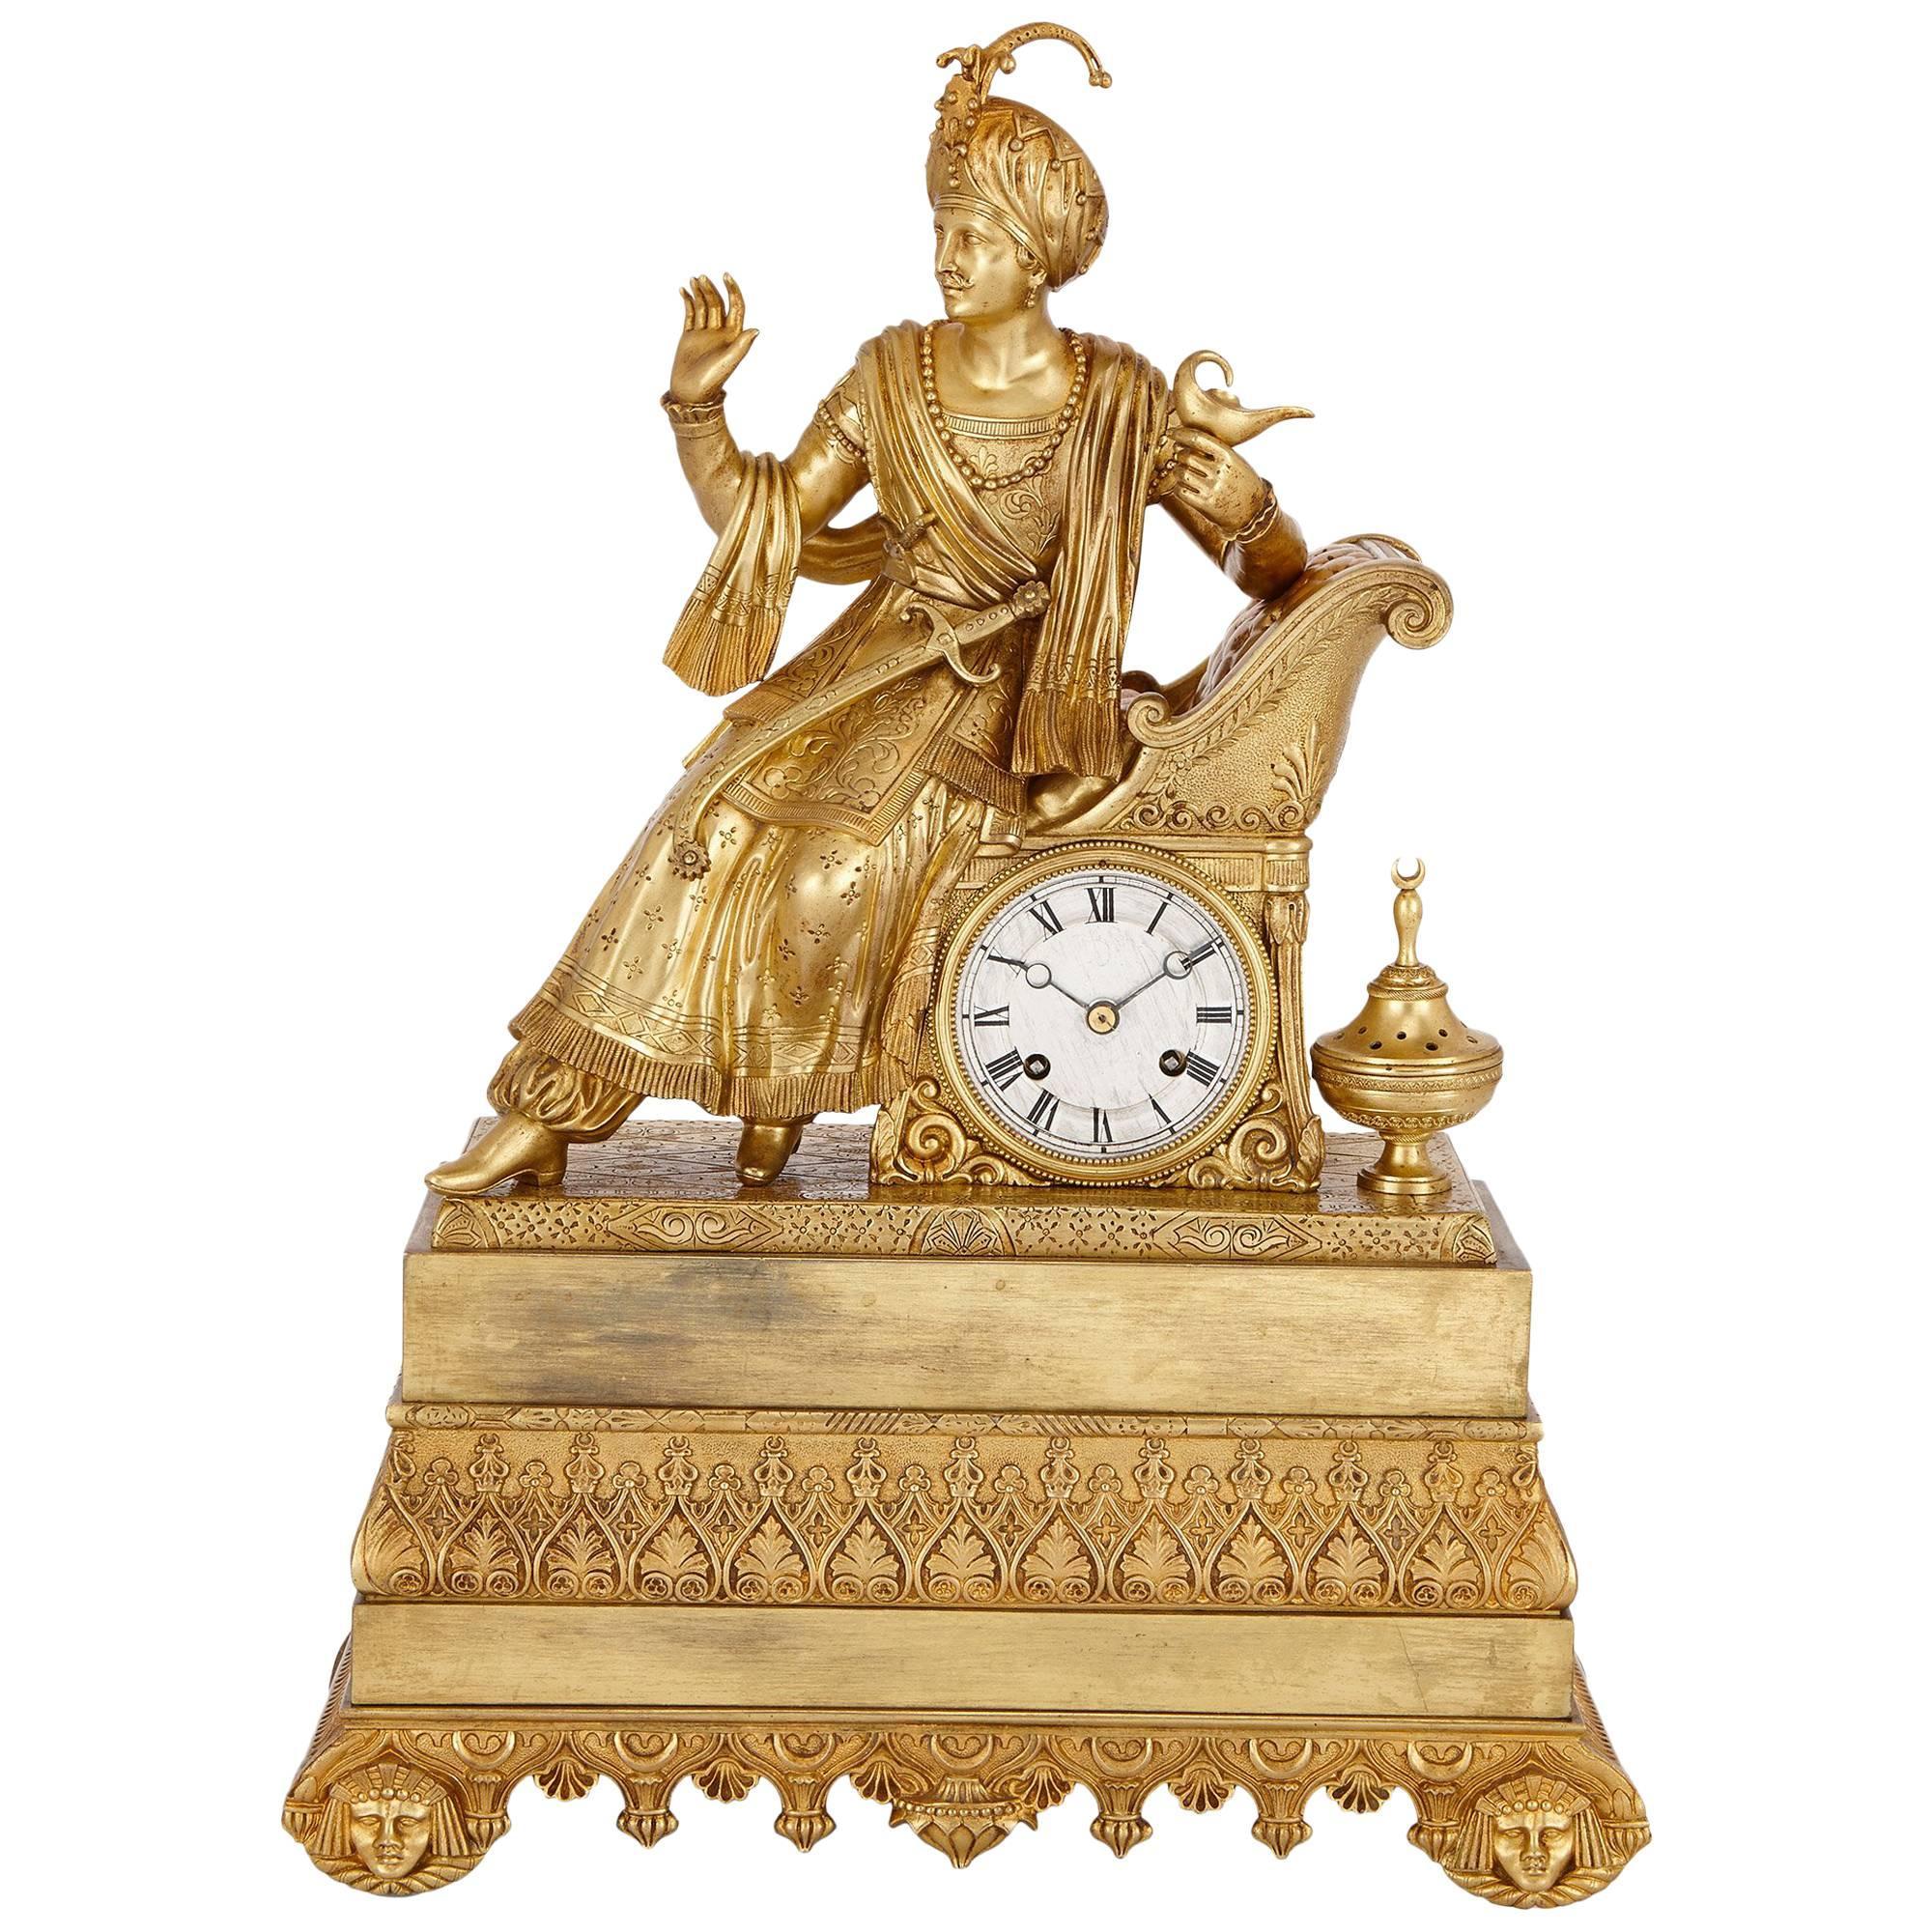 Antique French Orientalist Style Ormolu Mantel Clock